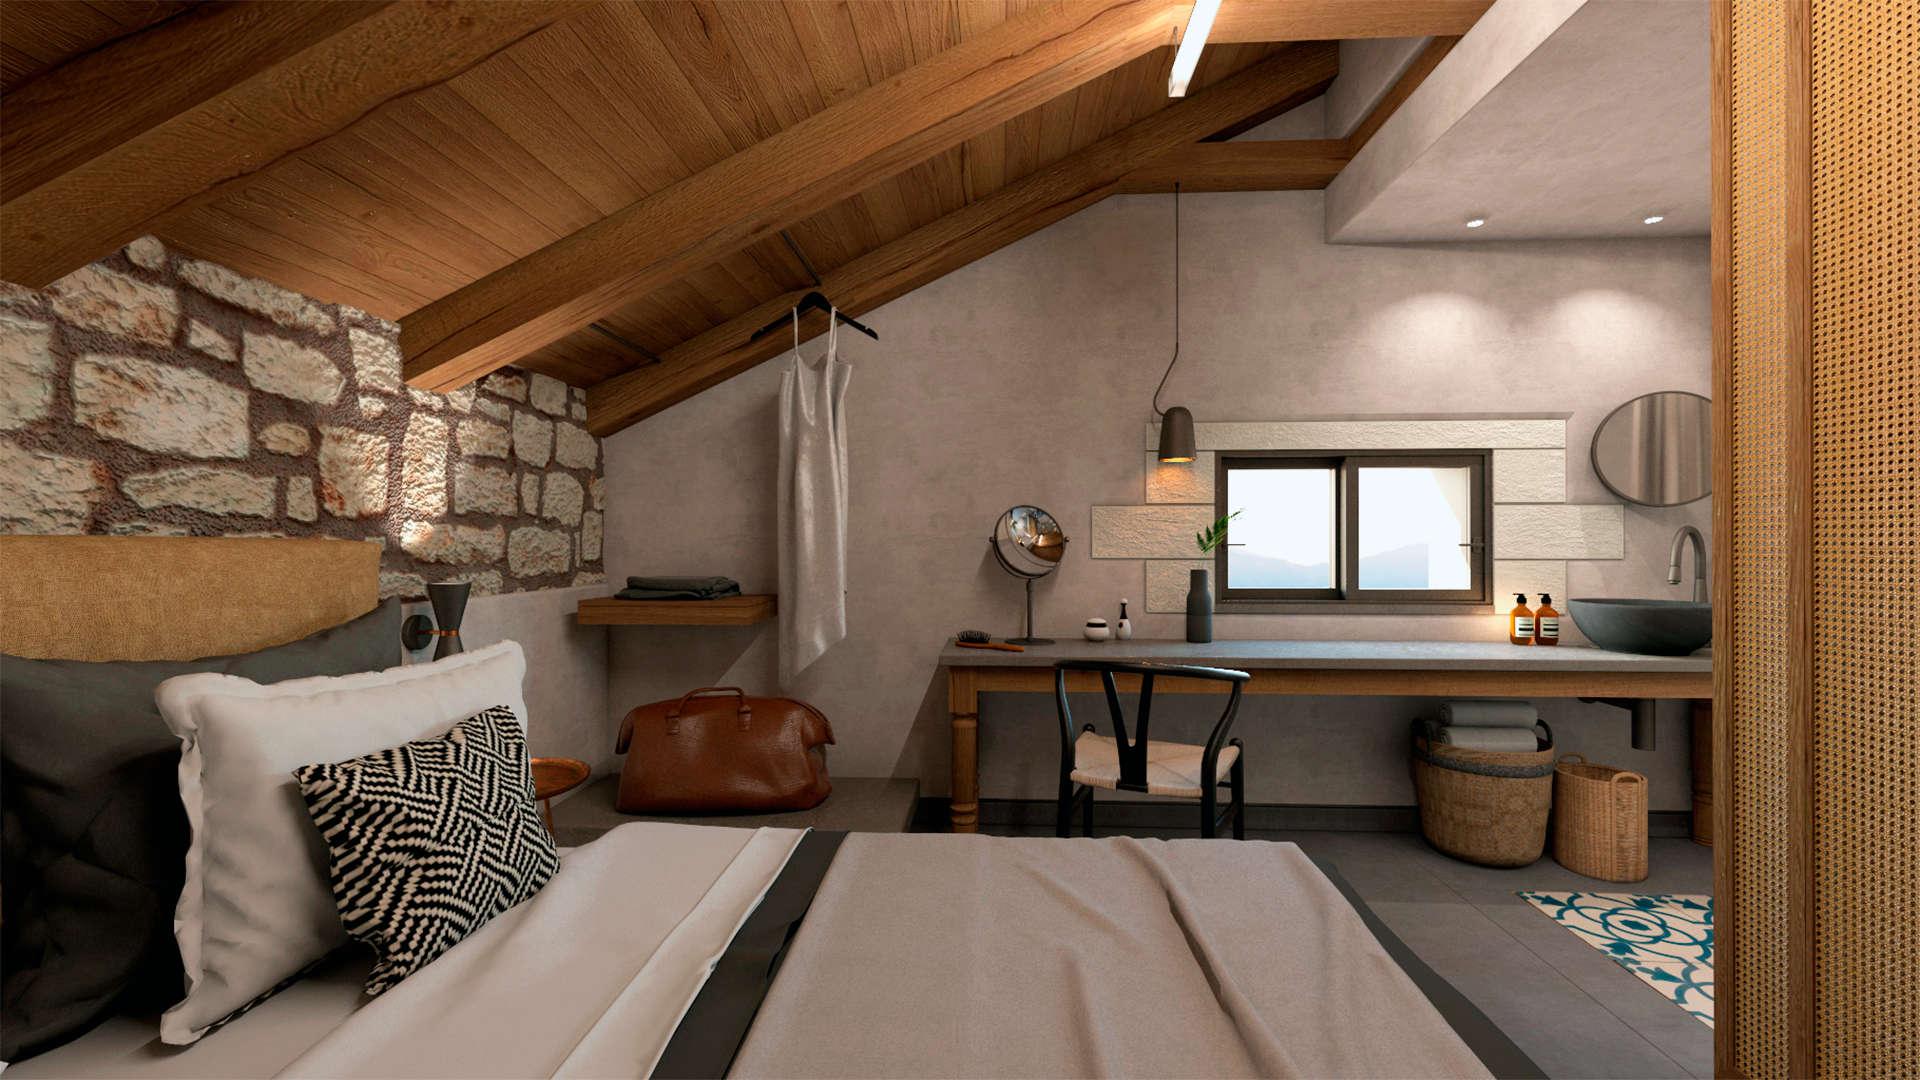 Holiday home, interior design, traditional touch, master bedroom. Παραθεριστική κατοικία, εσωτερικοί χώροι, κύριο υπνοδωμάτιο, παραδοσιακό ύφος, διακόσμηση.